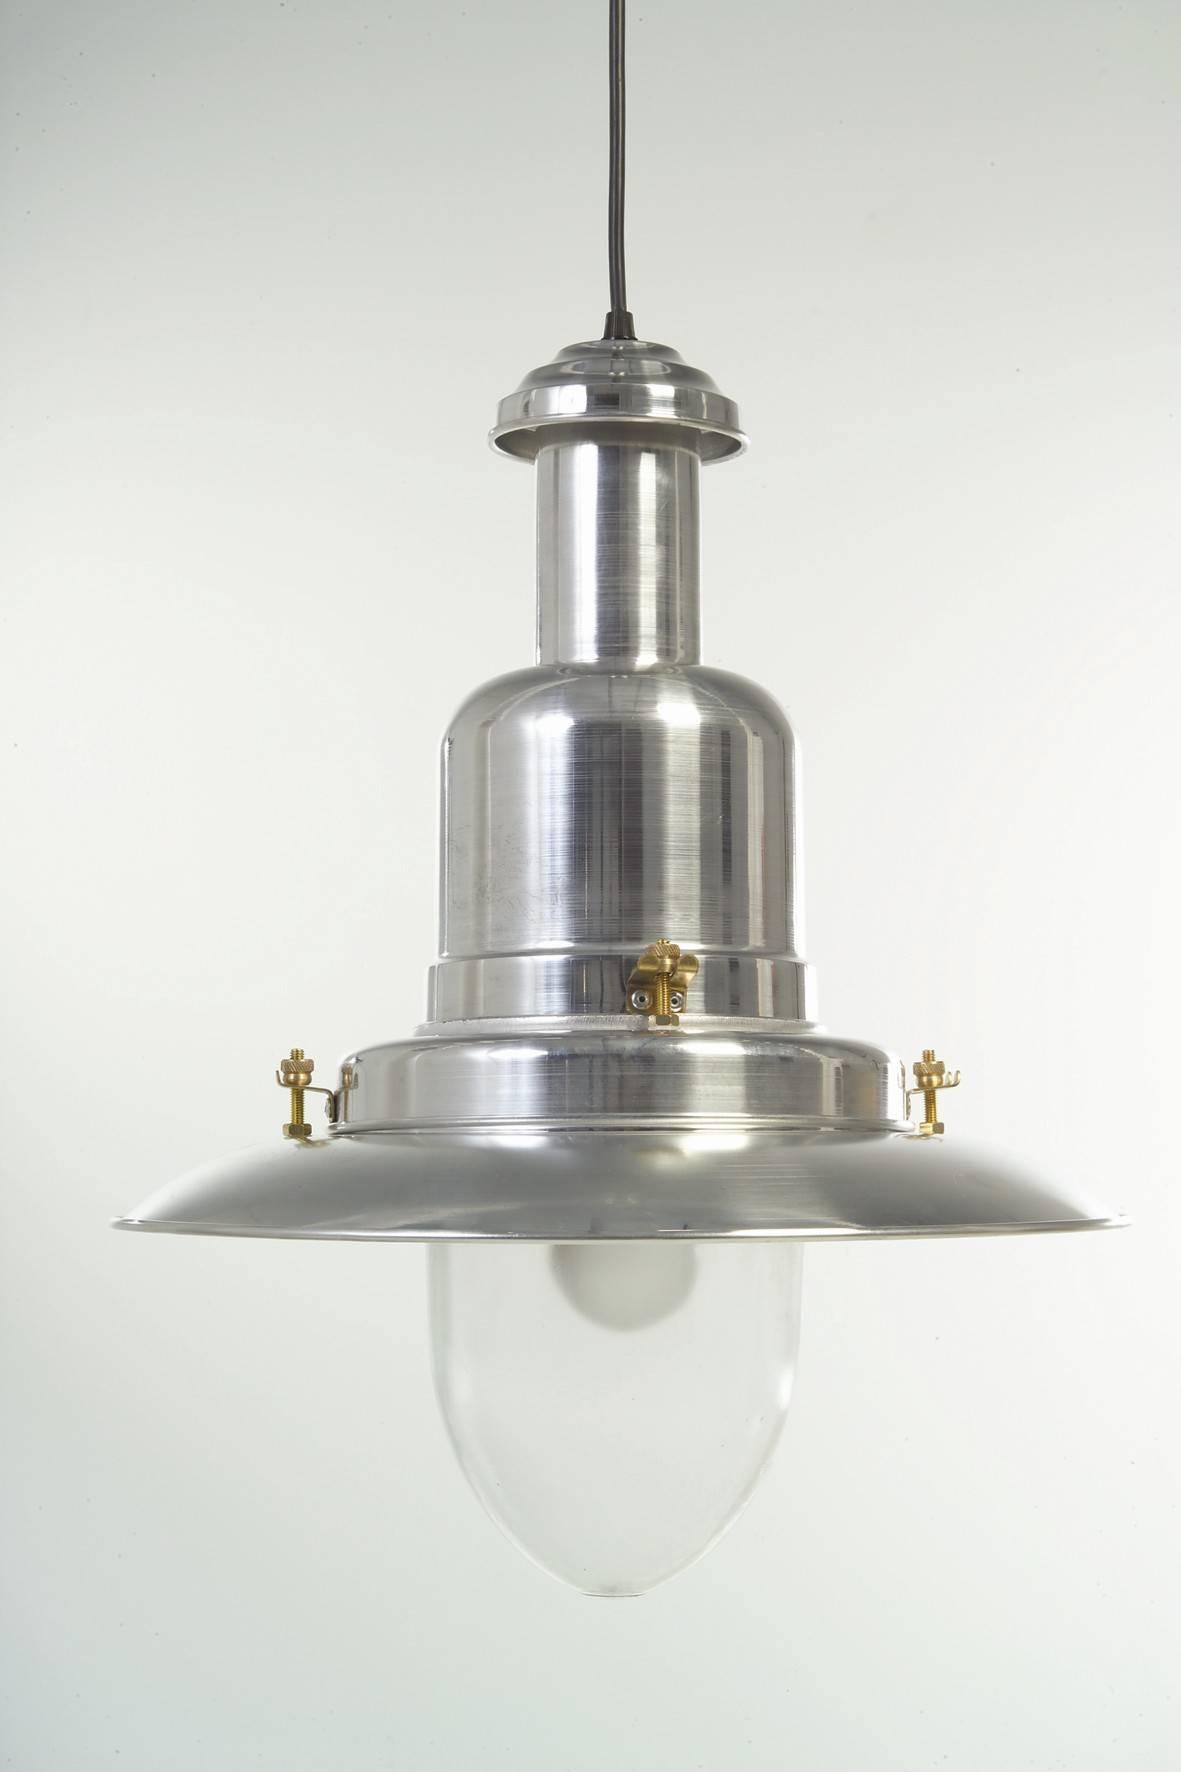 Great Stainless Steel Pendant Light Fixtures 50 For Your Modern regarding Stainless Steel Pendant Lights Fixtures (Image 2 of 15)